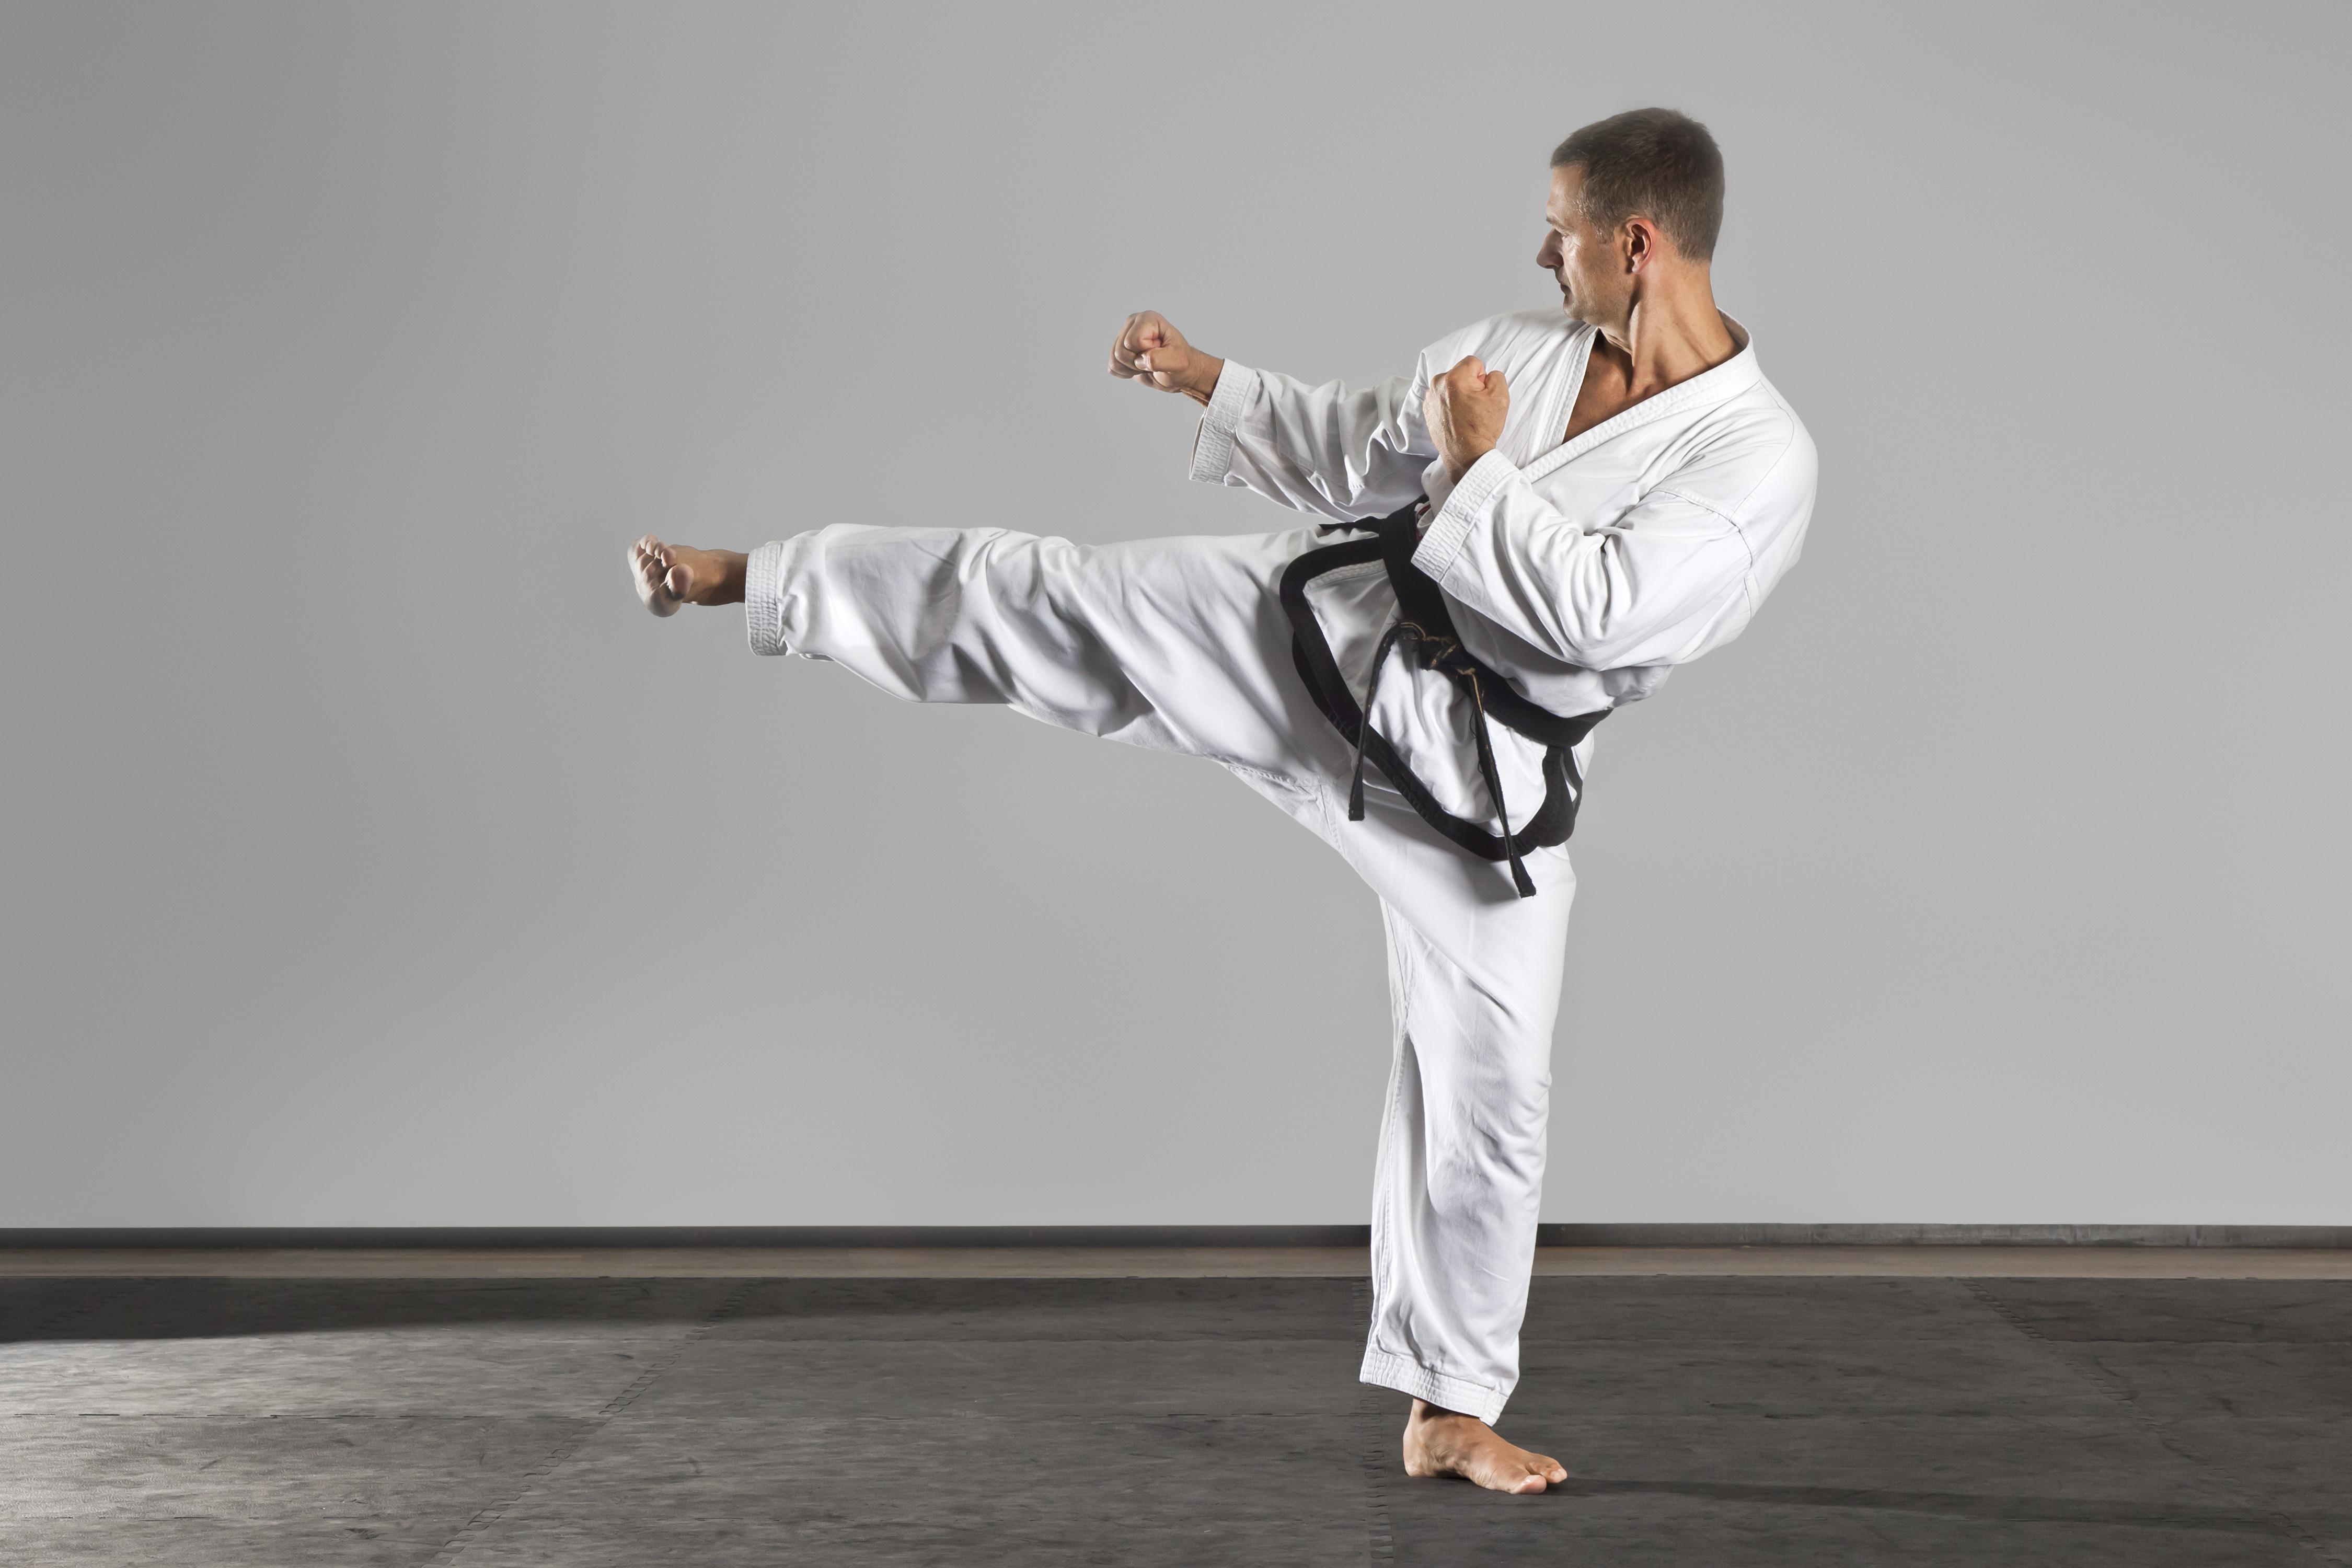 Wallpaper kenpo karate man old pose wallpapers sports   download 4500x3000